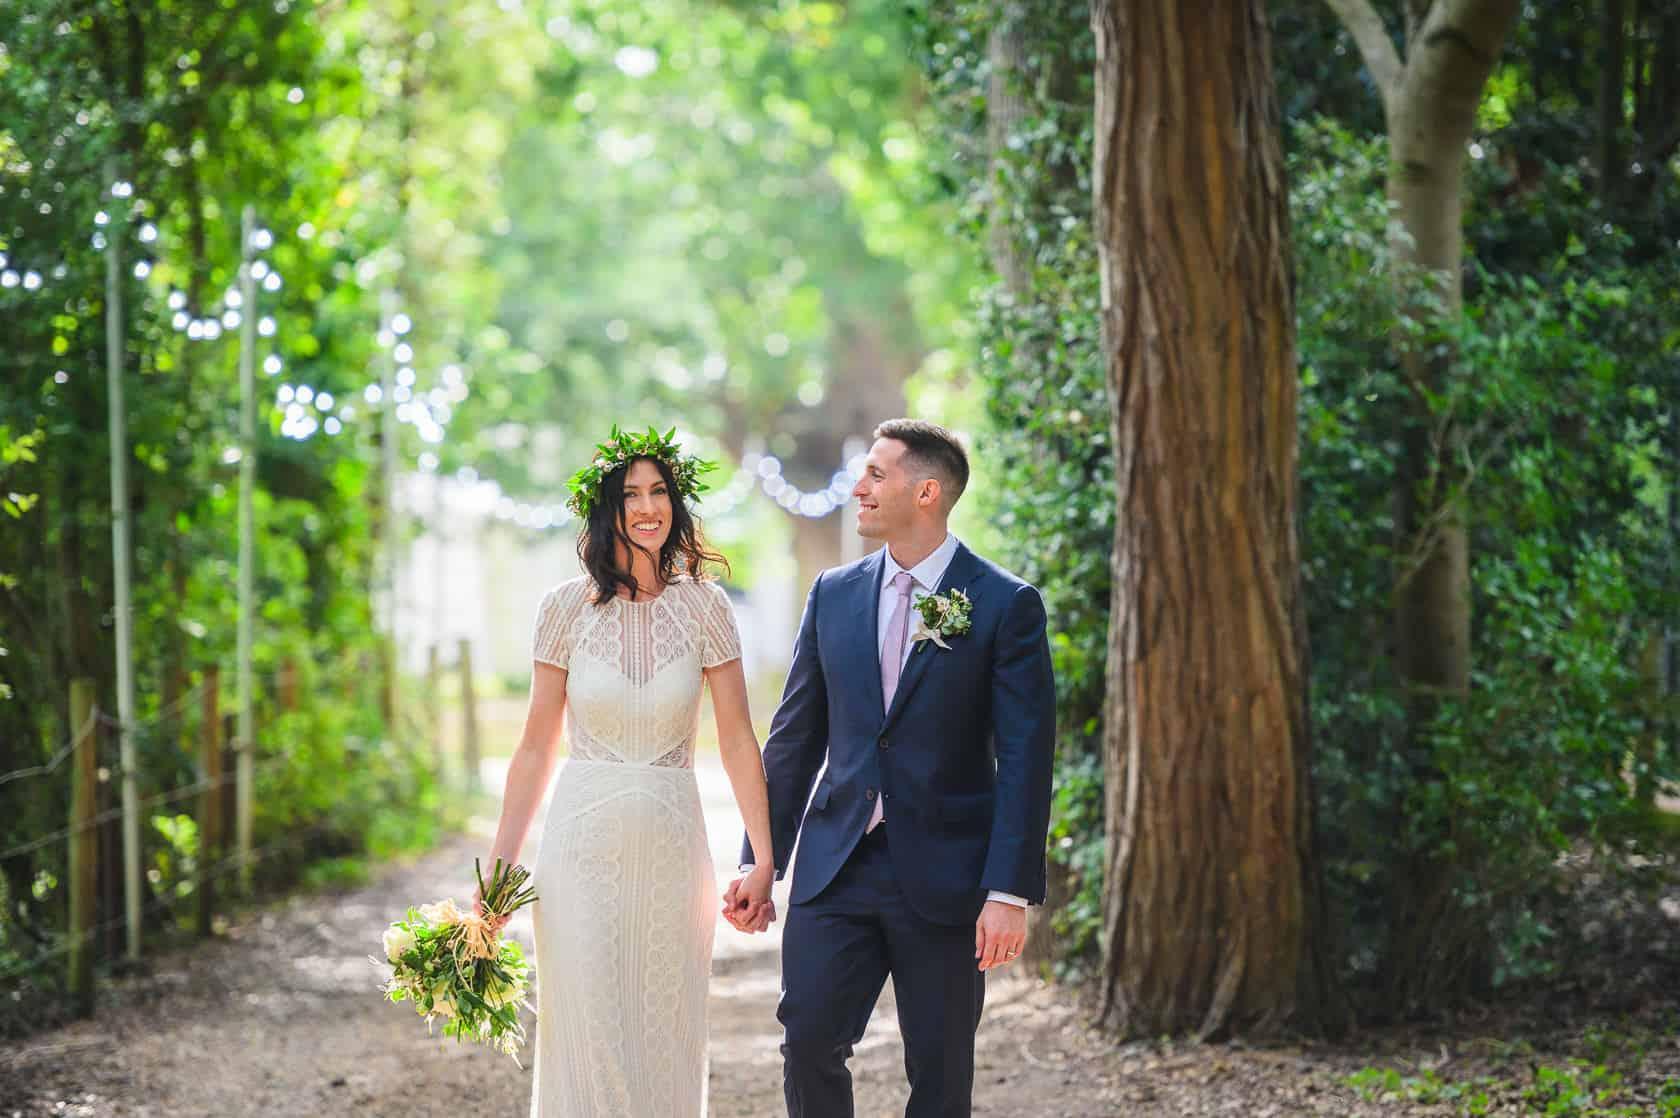 Best_Wedding_Photography_2019_Wedding-Photographer-Essex_016